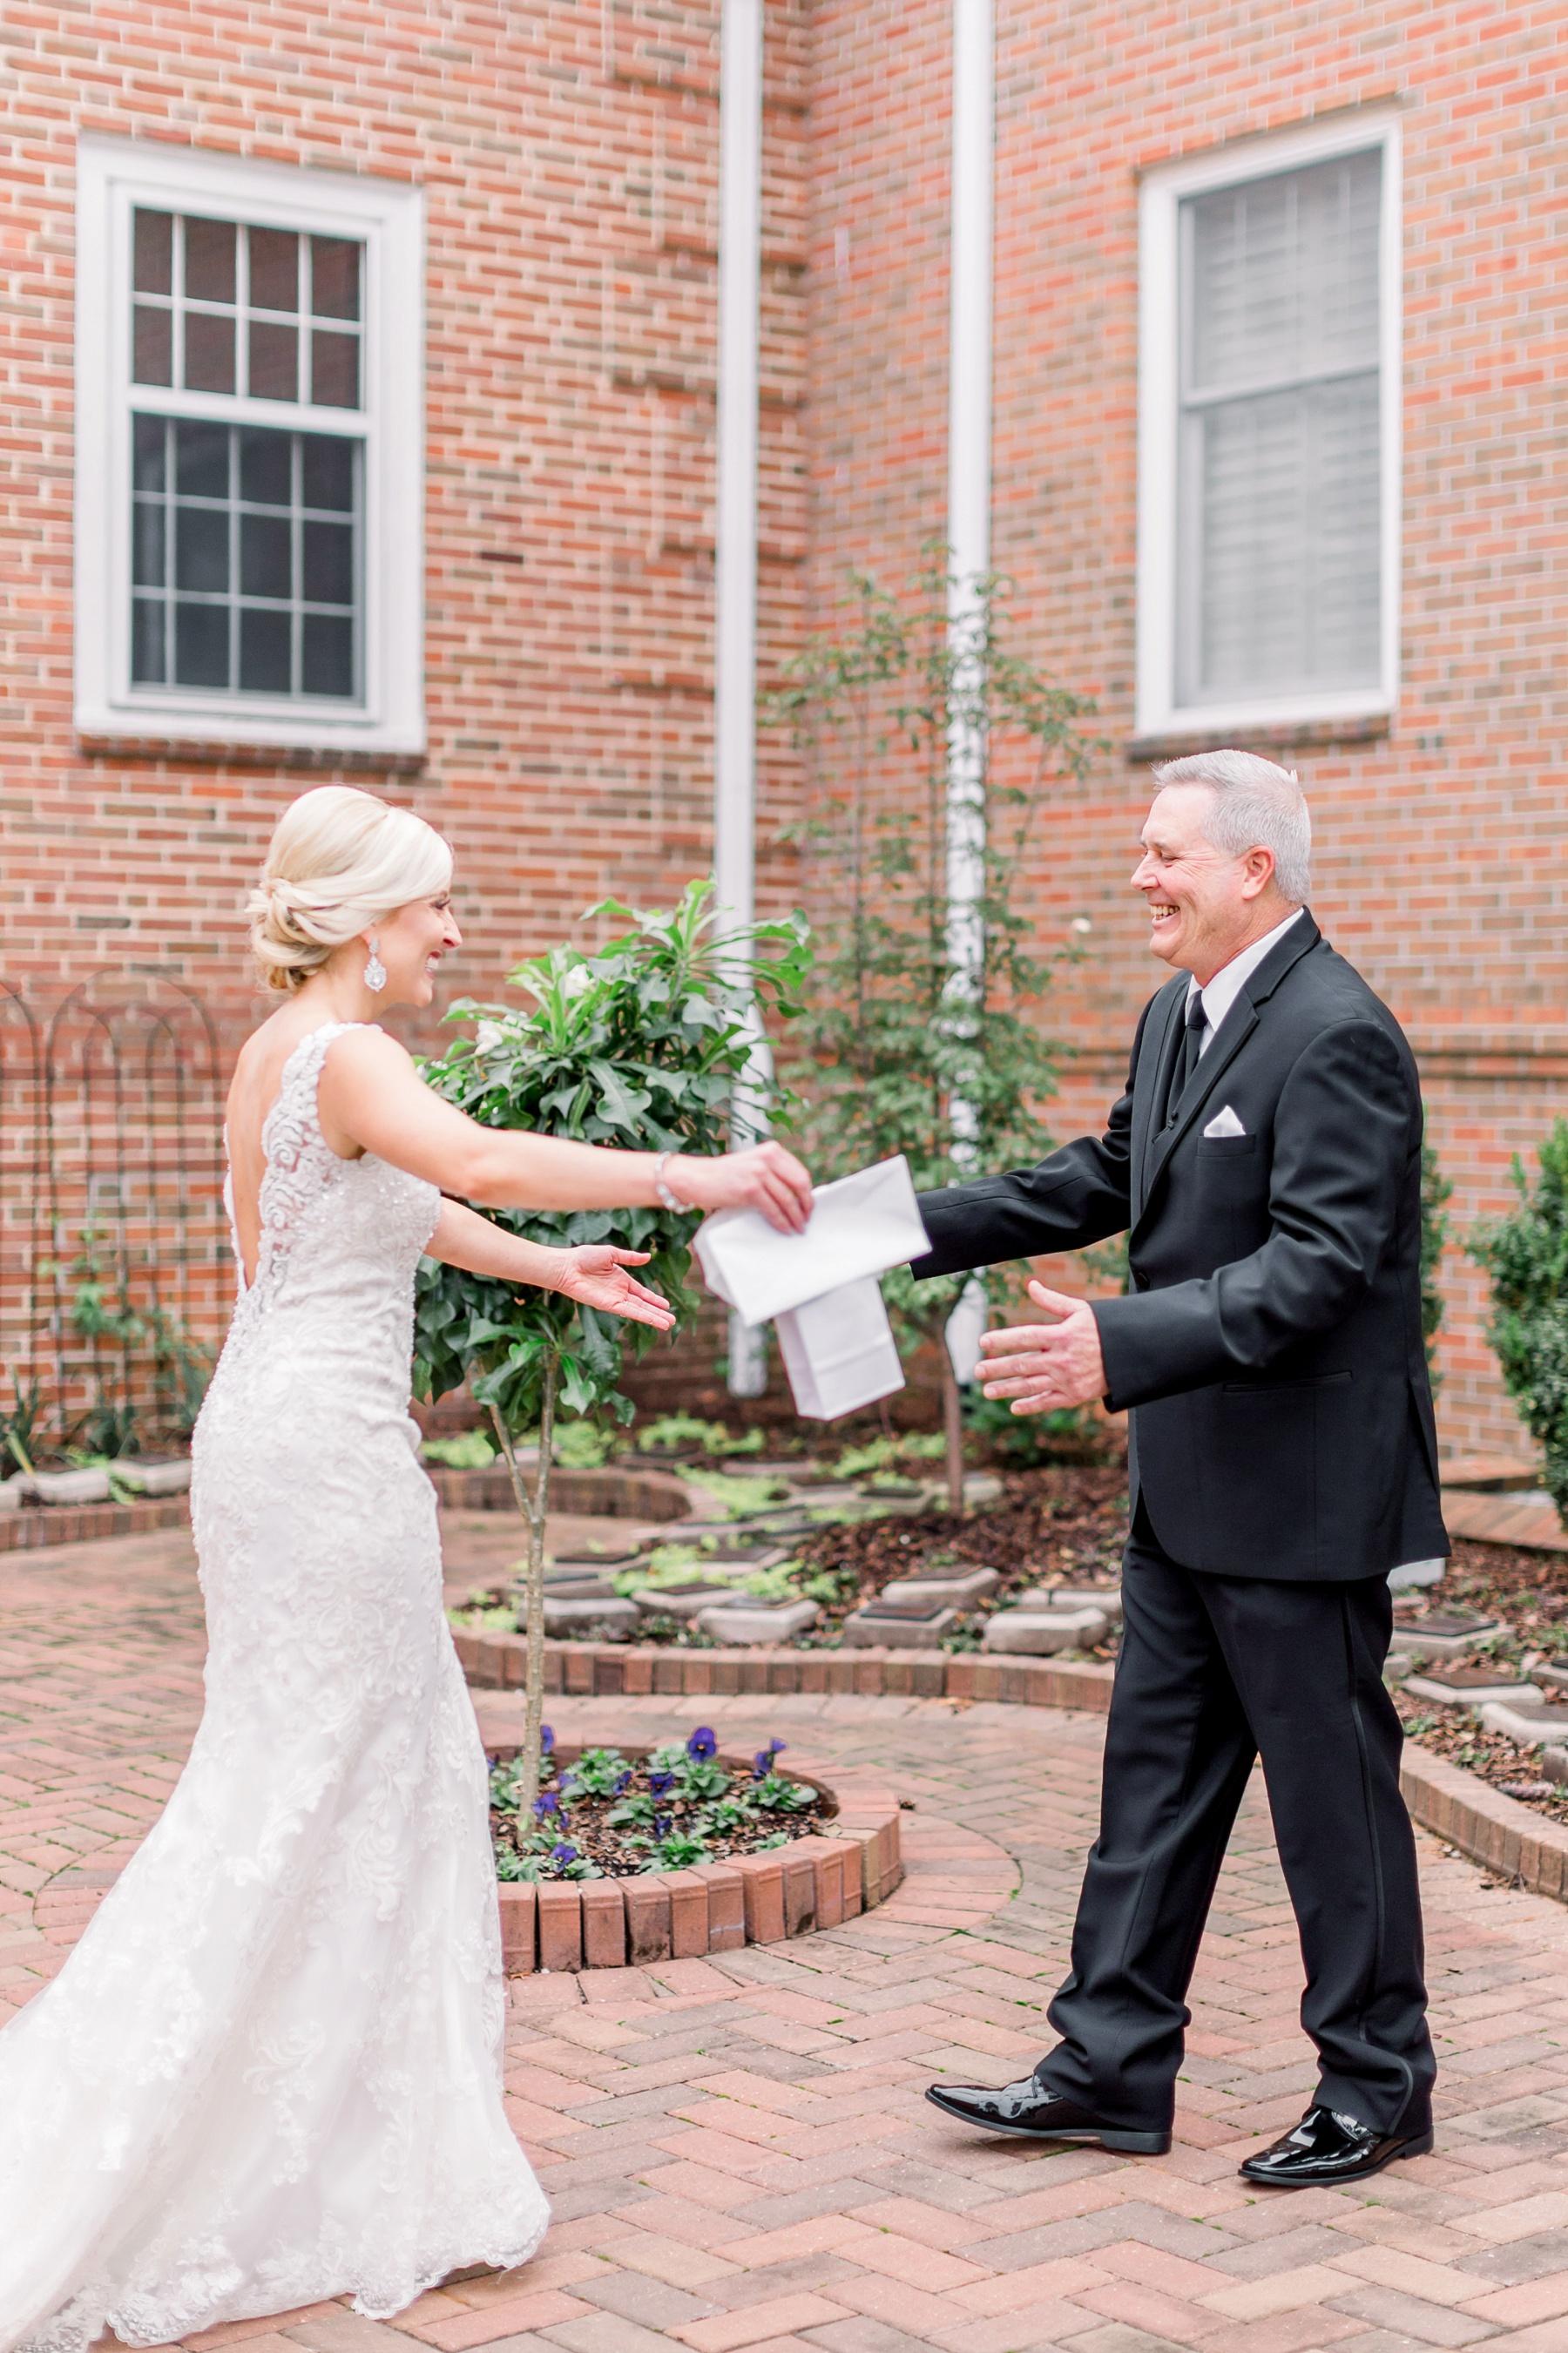 midwest-adventurous-wedding-photographer-elizabeth-ladean-photography-photo_4706.jpg